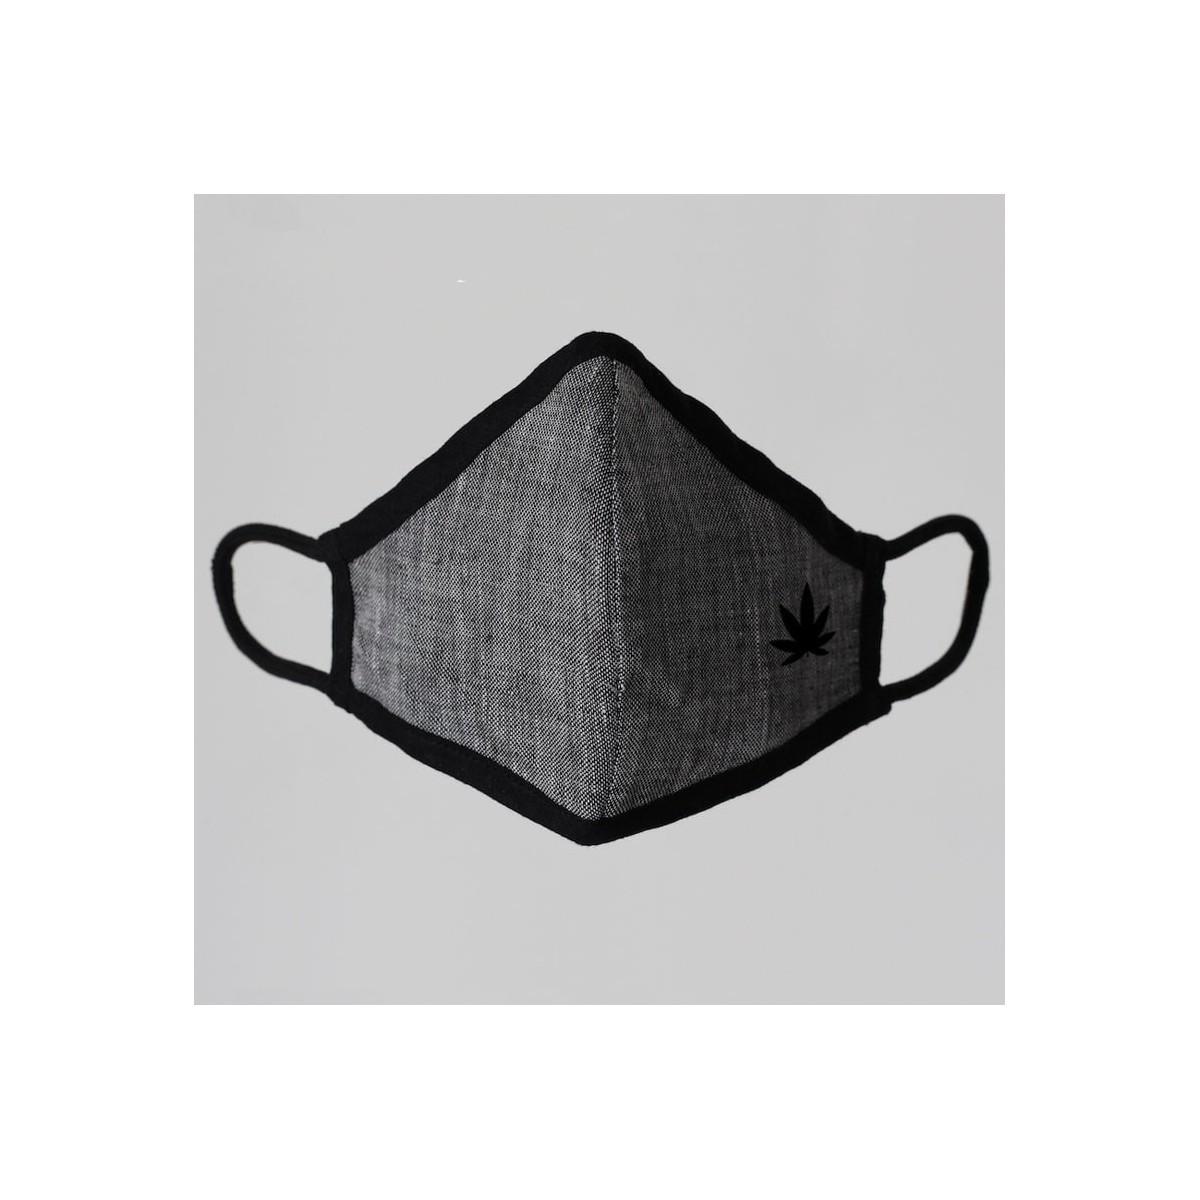 Masque facial en chanvre  - 3